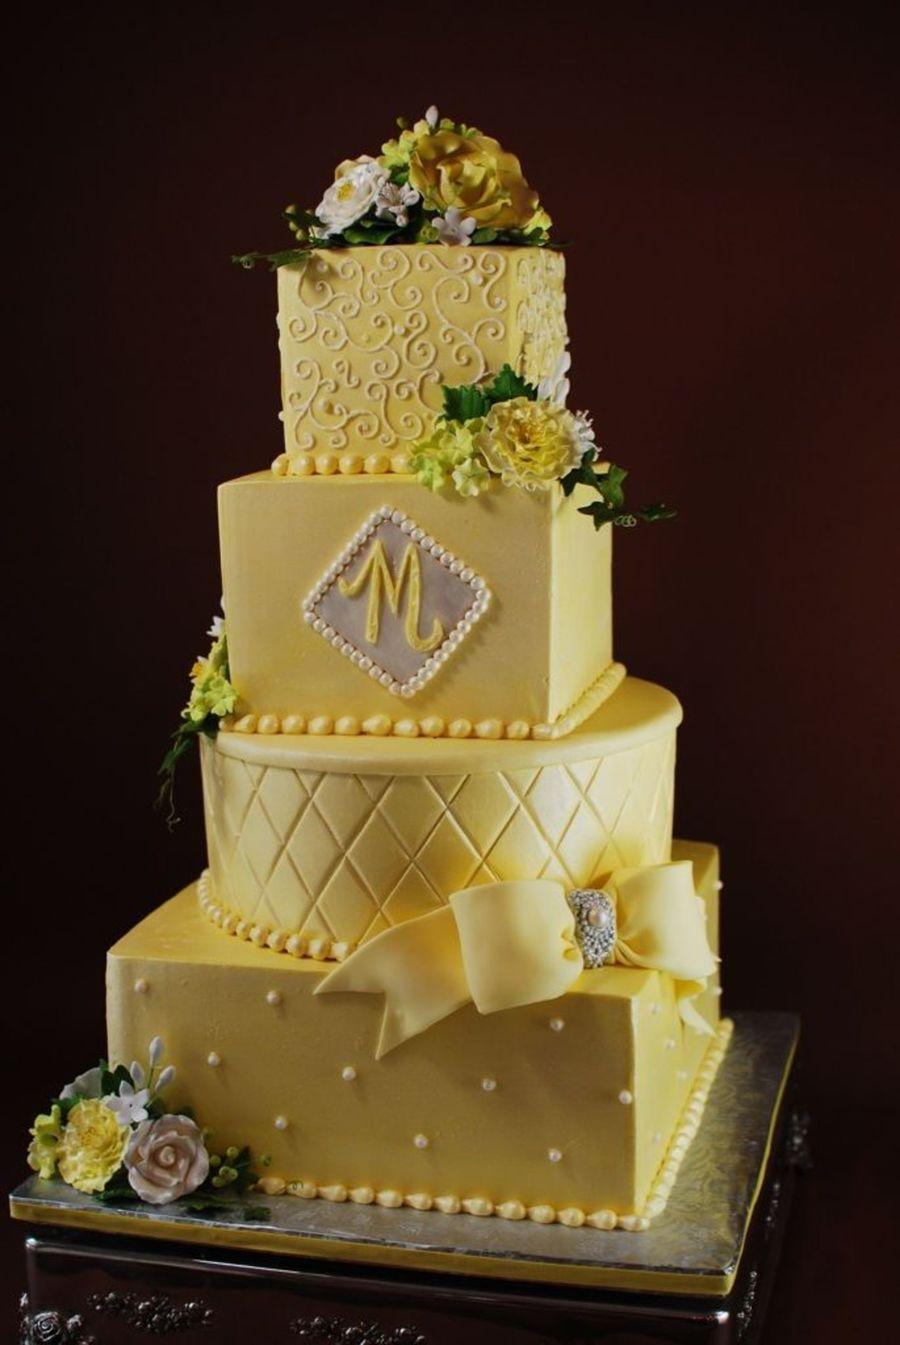 Sunshine And Buttercream Wedding Cake - CakeCentral.com